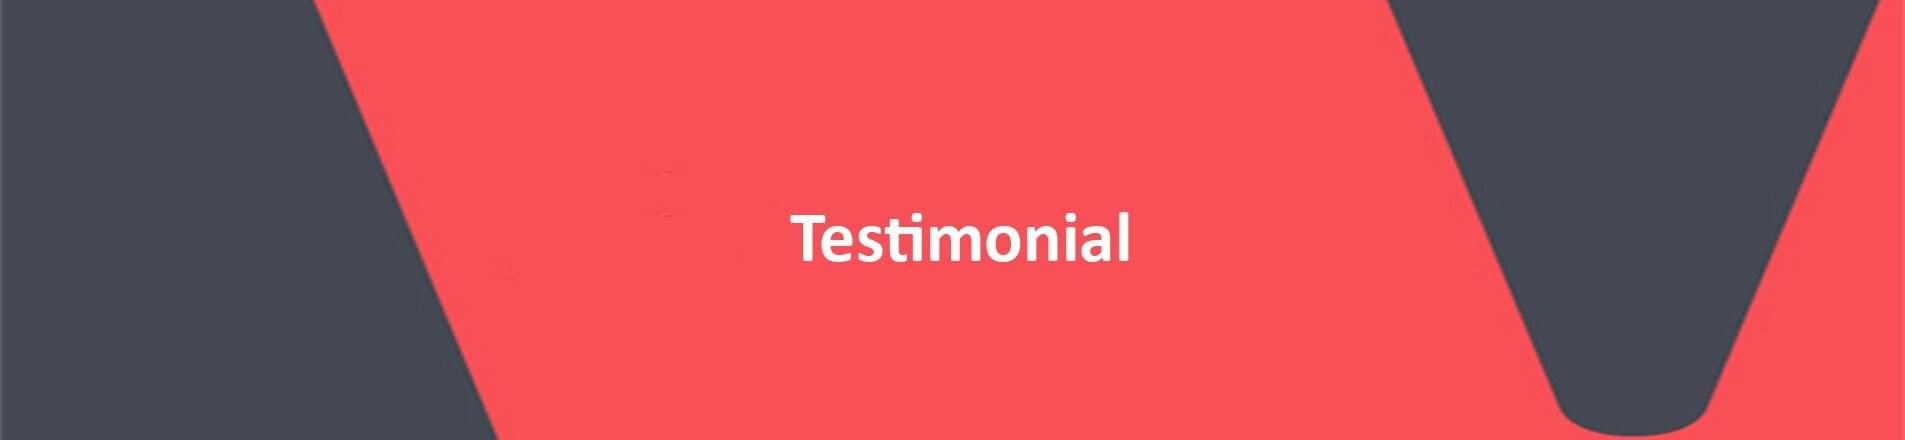 The word 'testimonial' on red VERCIDA background